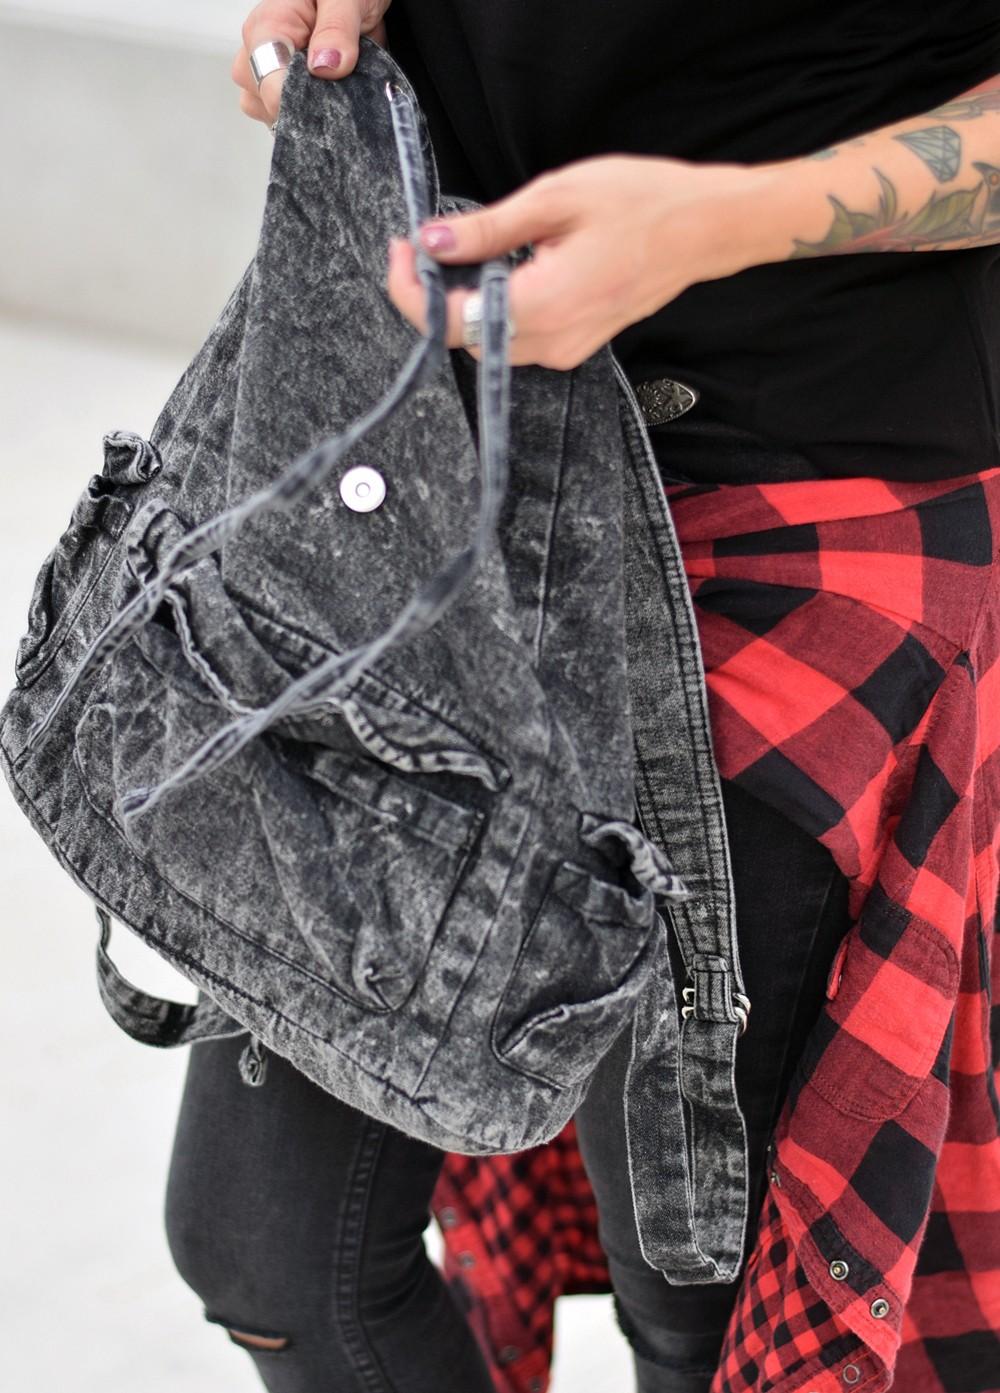 Outfir Karohemd Jeans Hut Rucksack 7